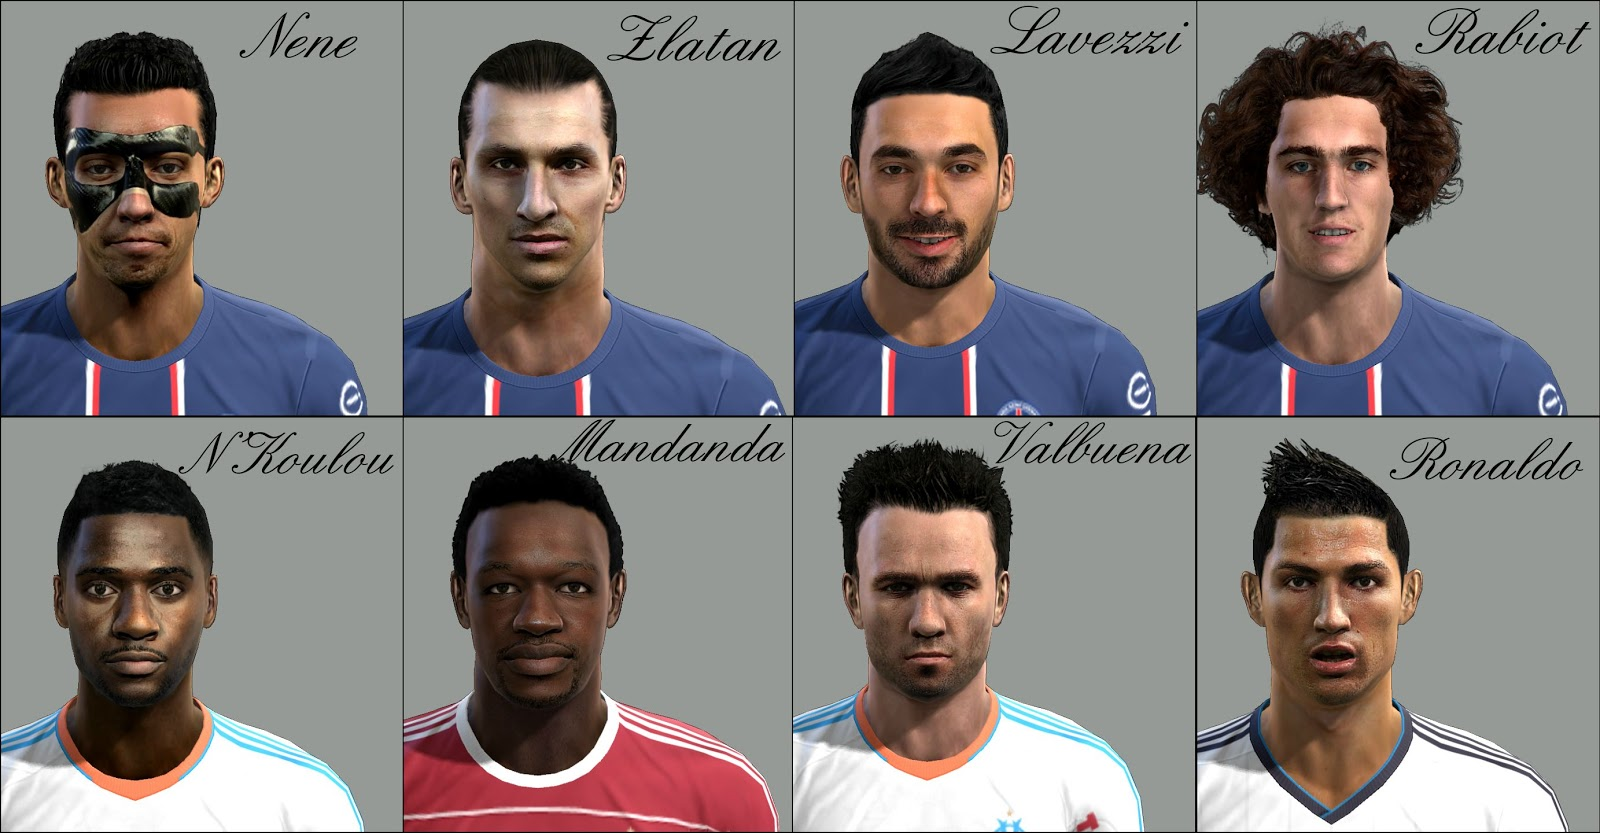 Nenê, Ibrahimović, Ezequiel Lavezzi, Adrien Rabiot, N'Koulou, Mandanda, Valbuena e Cristiano Ronaldo Faces - PES 2013